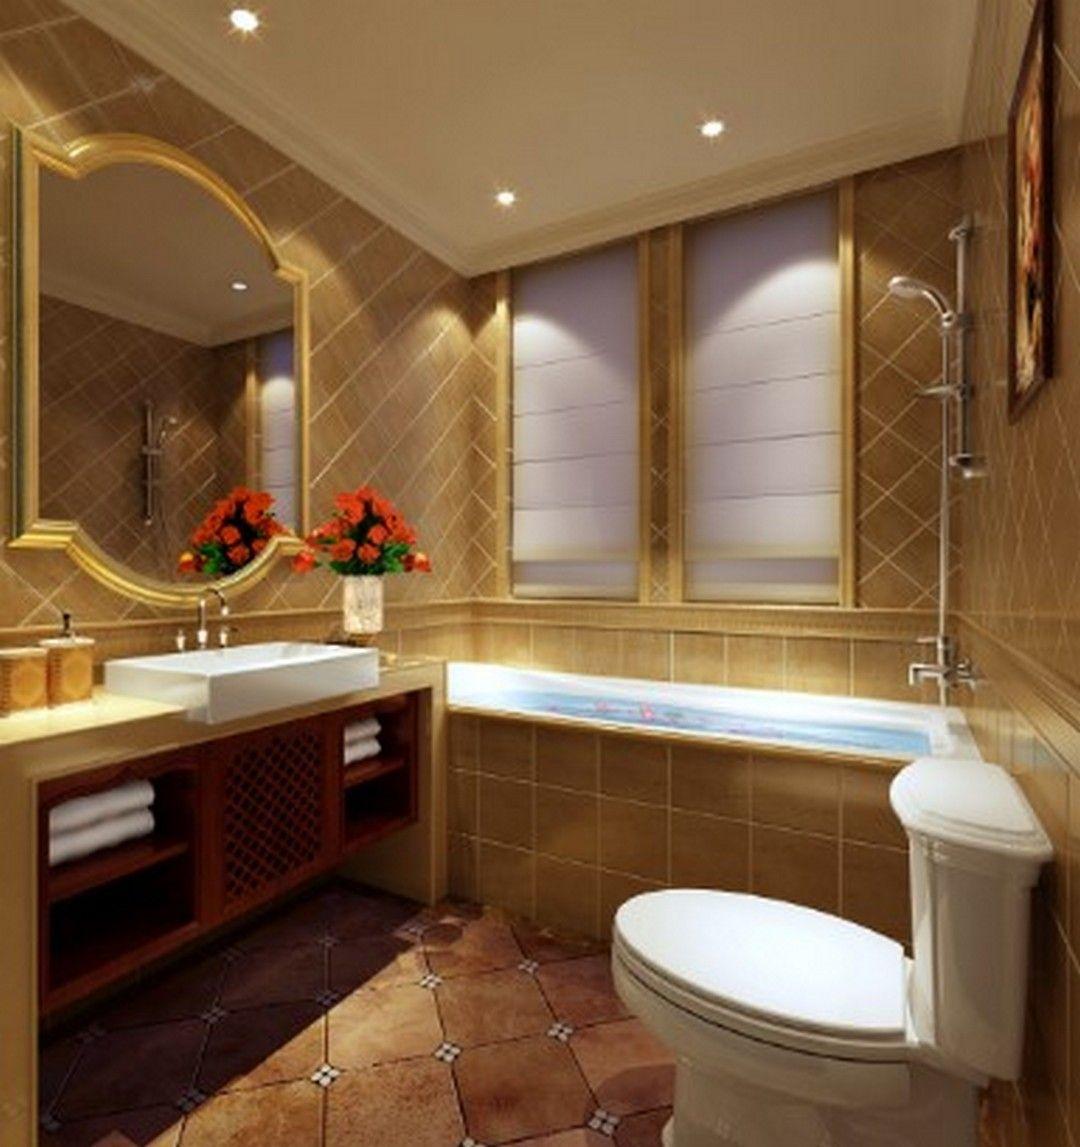 10 Luxury Bathroom Models For Modern Homes | Small luxury ... on Model Toilet Design  id=77322